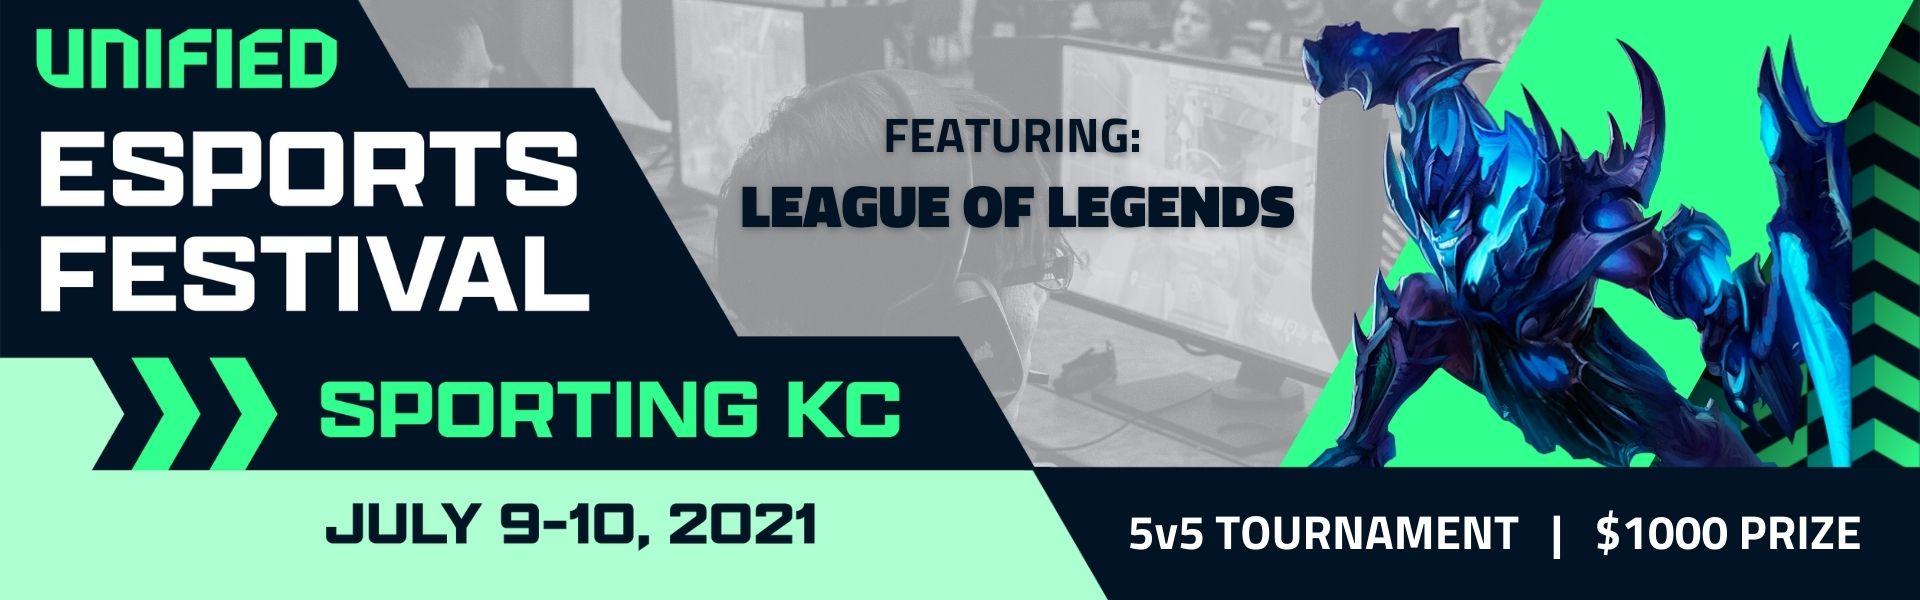 EF:SKC Featuring League of Legends (PC)